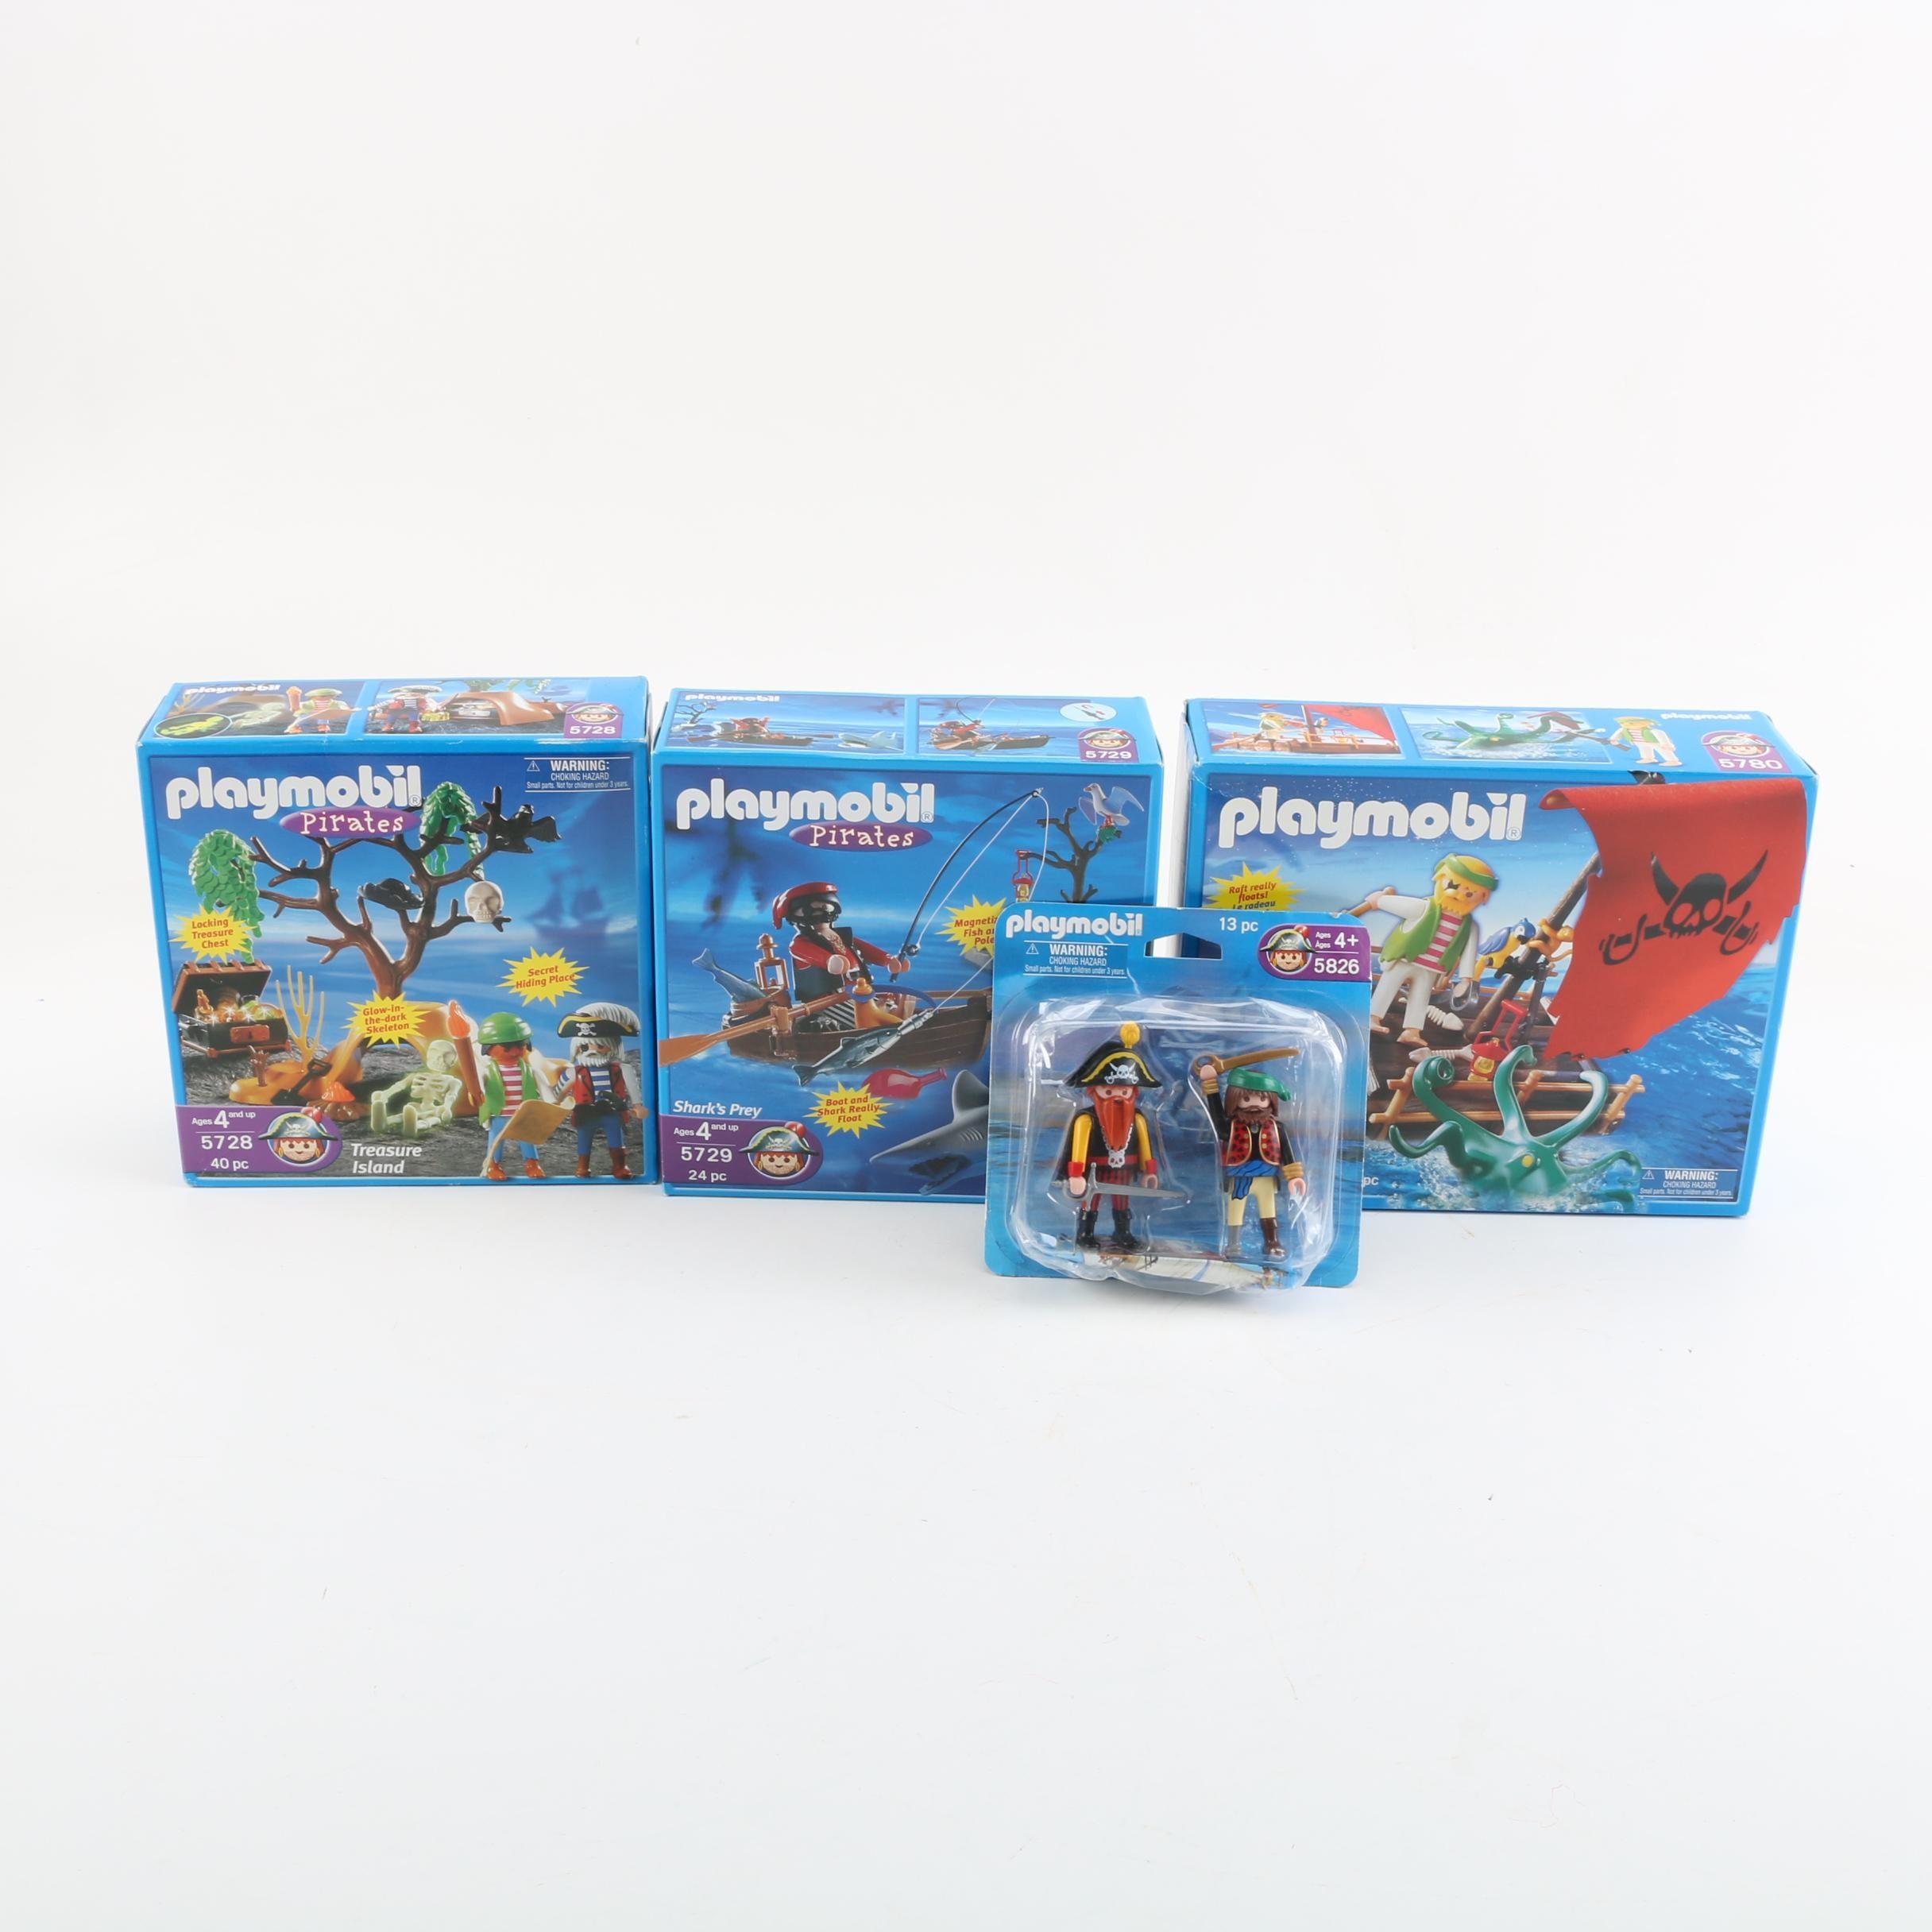 Playmobil Pirates Toys